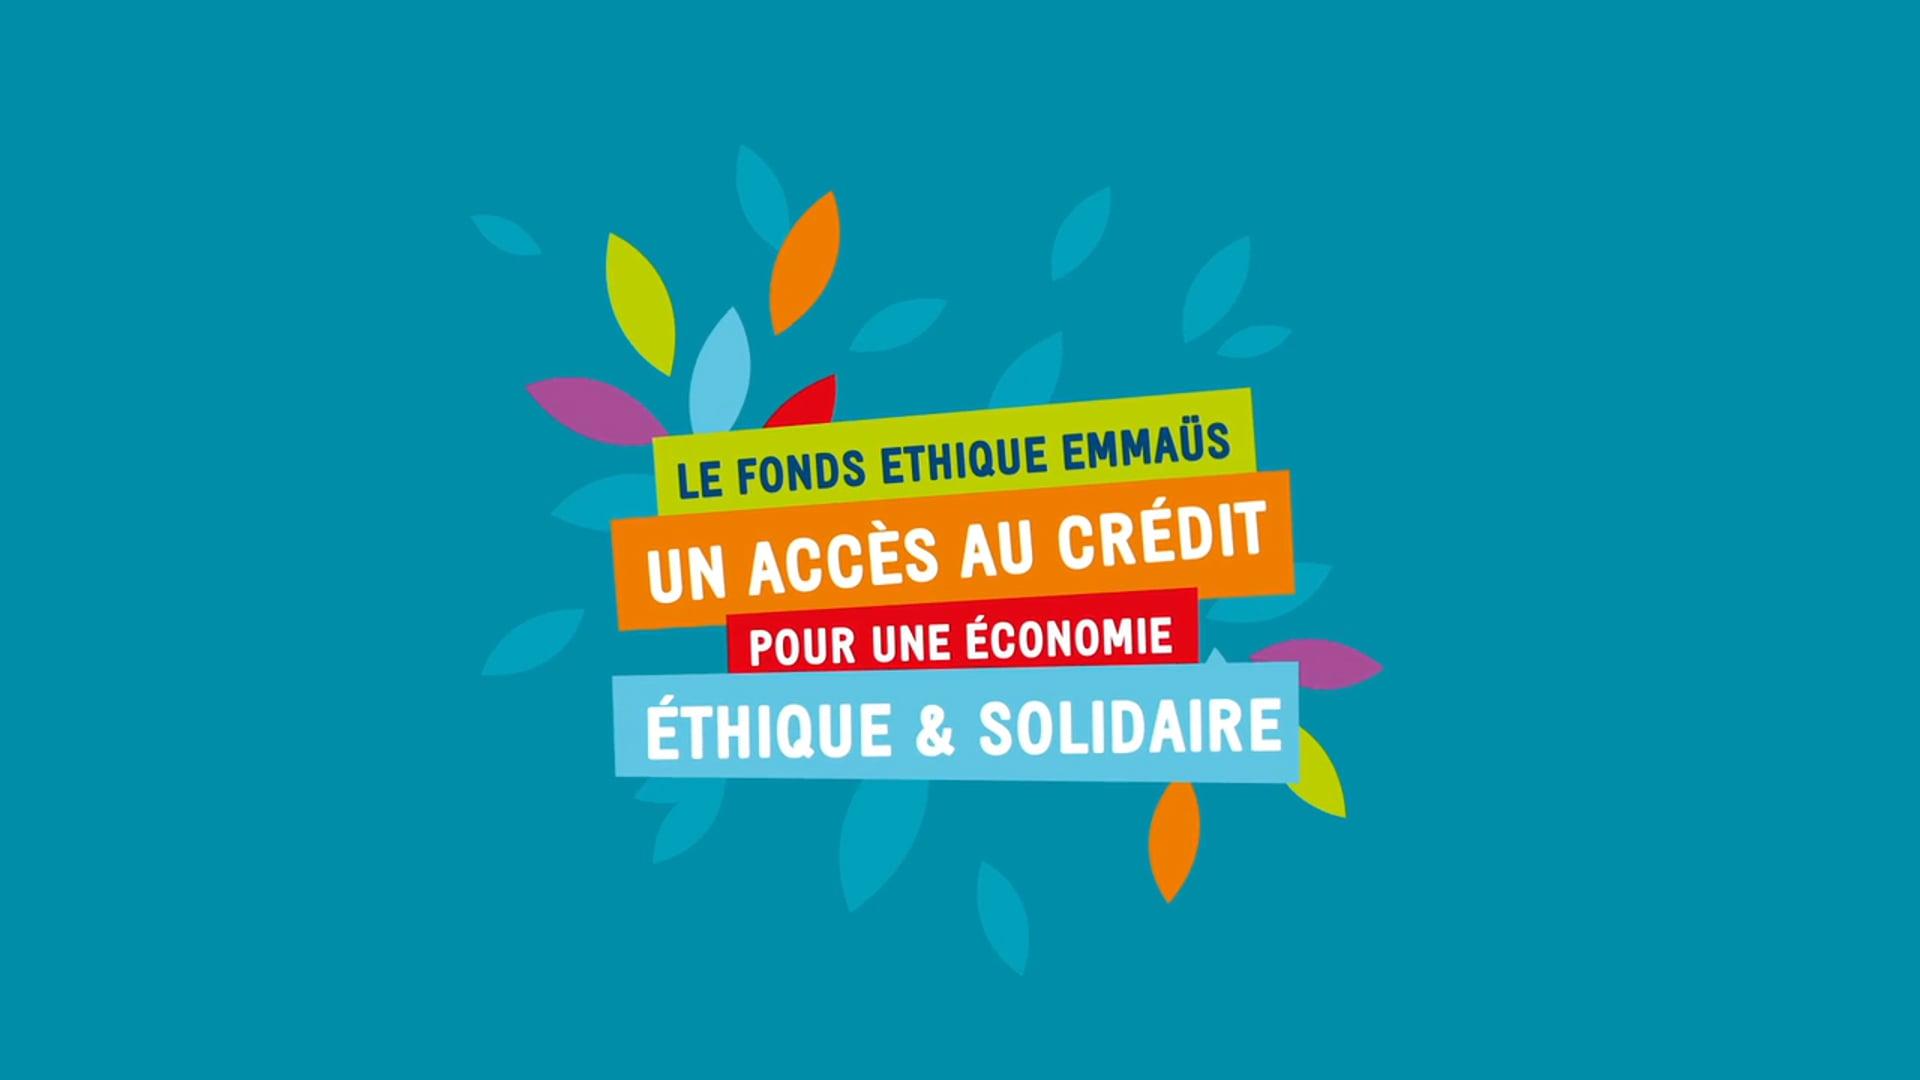 Emmaüs International | Fonds Ethique Emmaüs